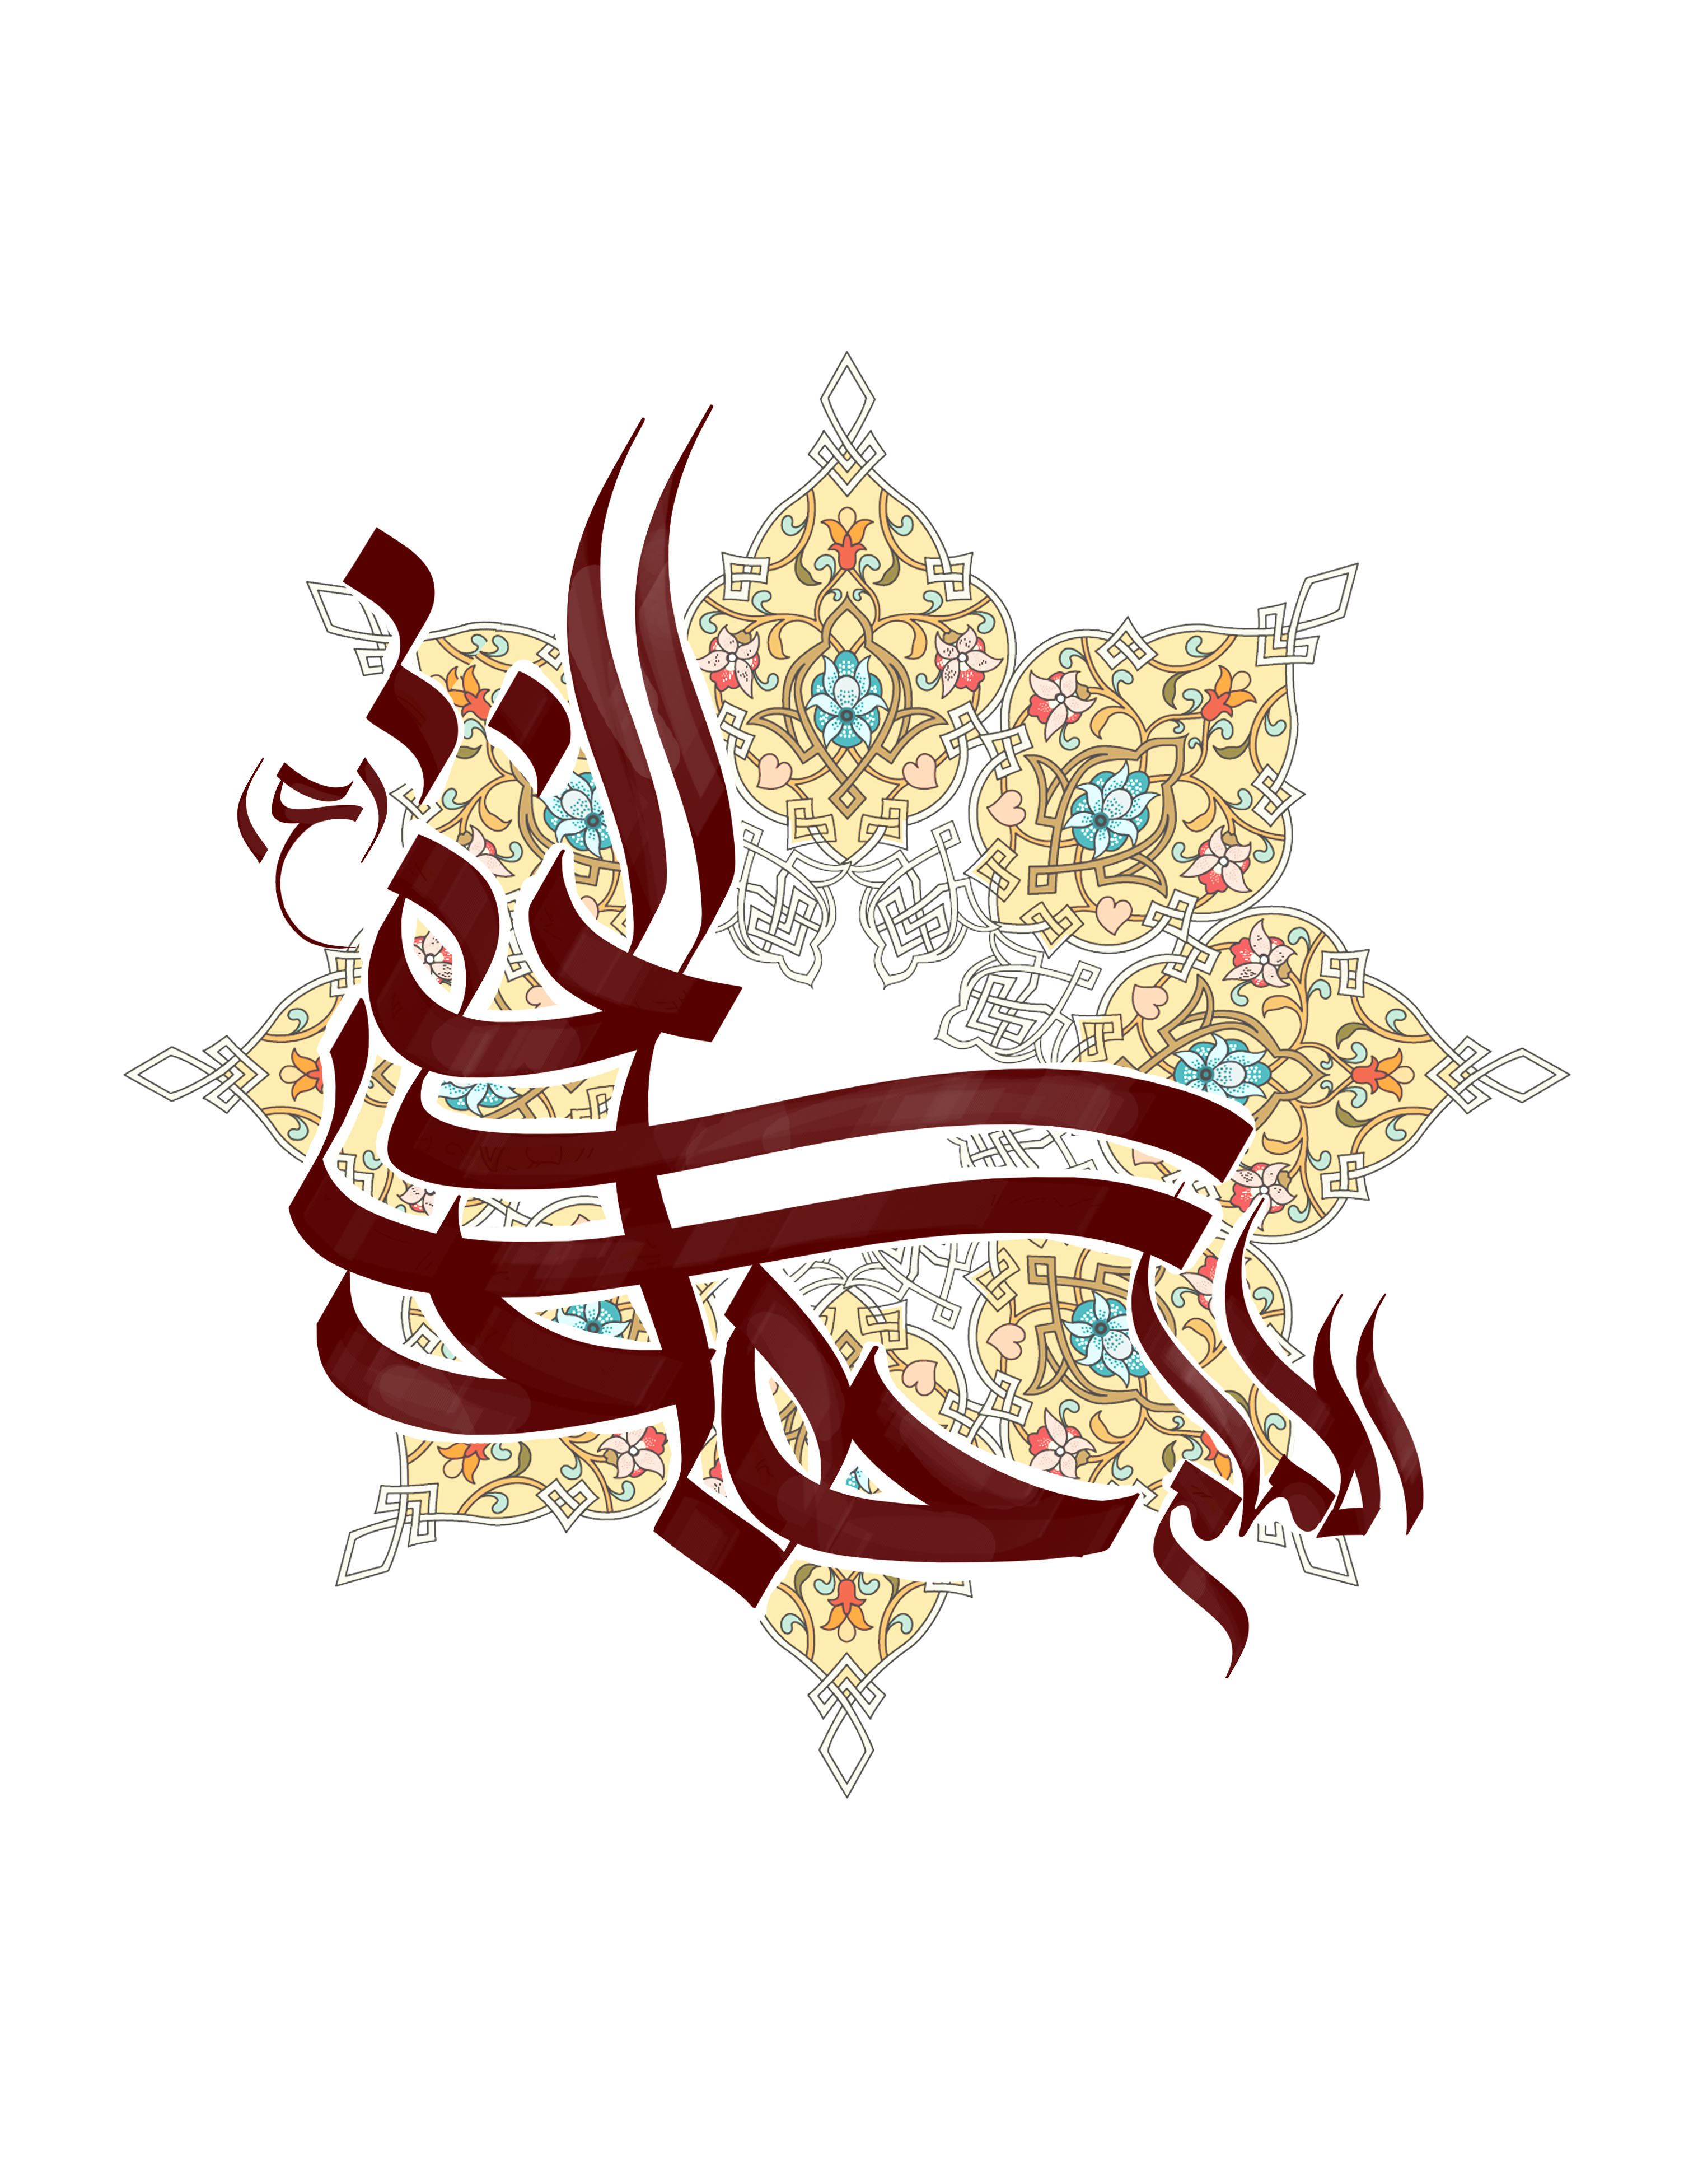 http://dl.aviny.com/Album/mazhabi/ahlbeit/hadi/veladat/kamel/16.jpg